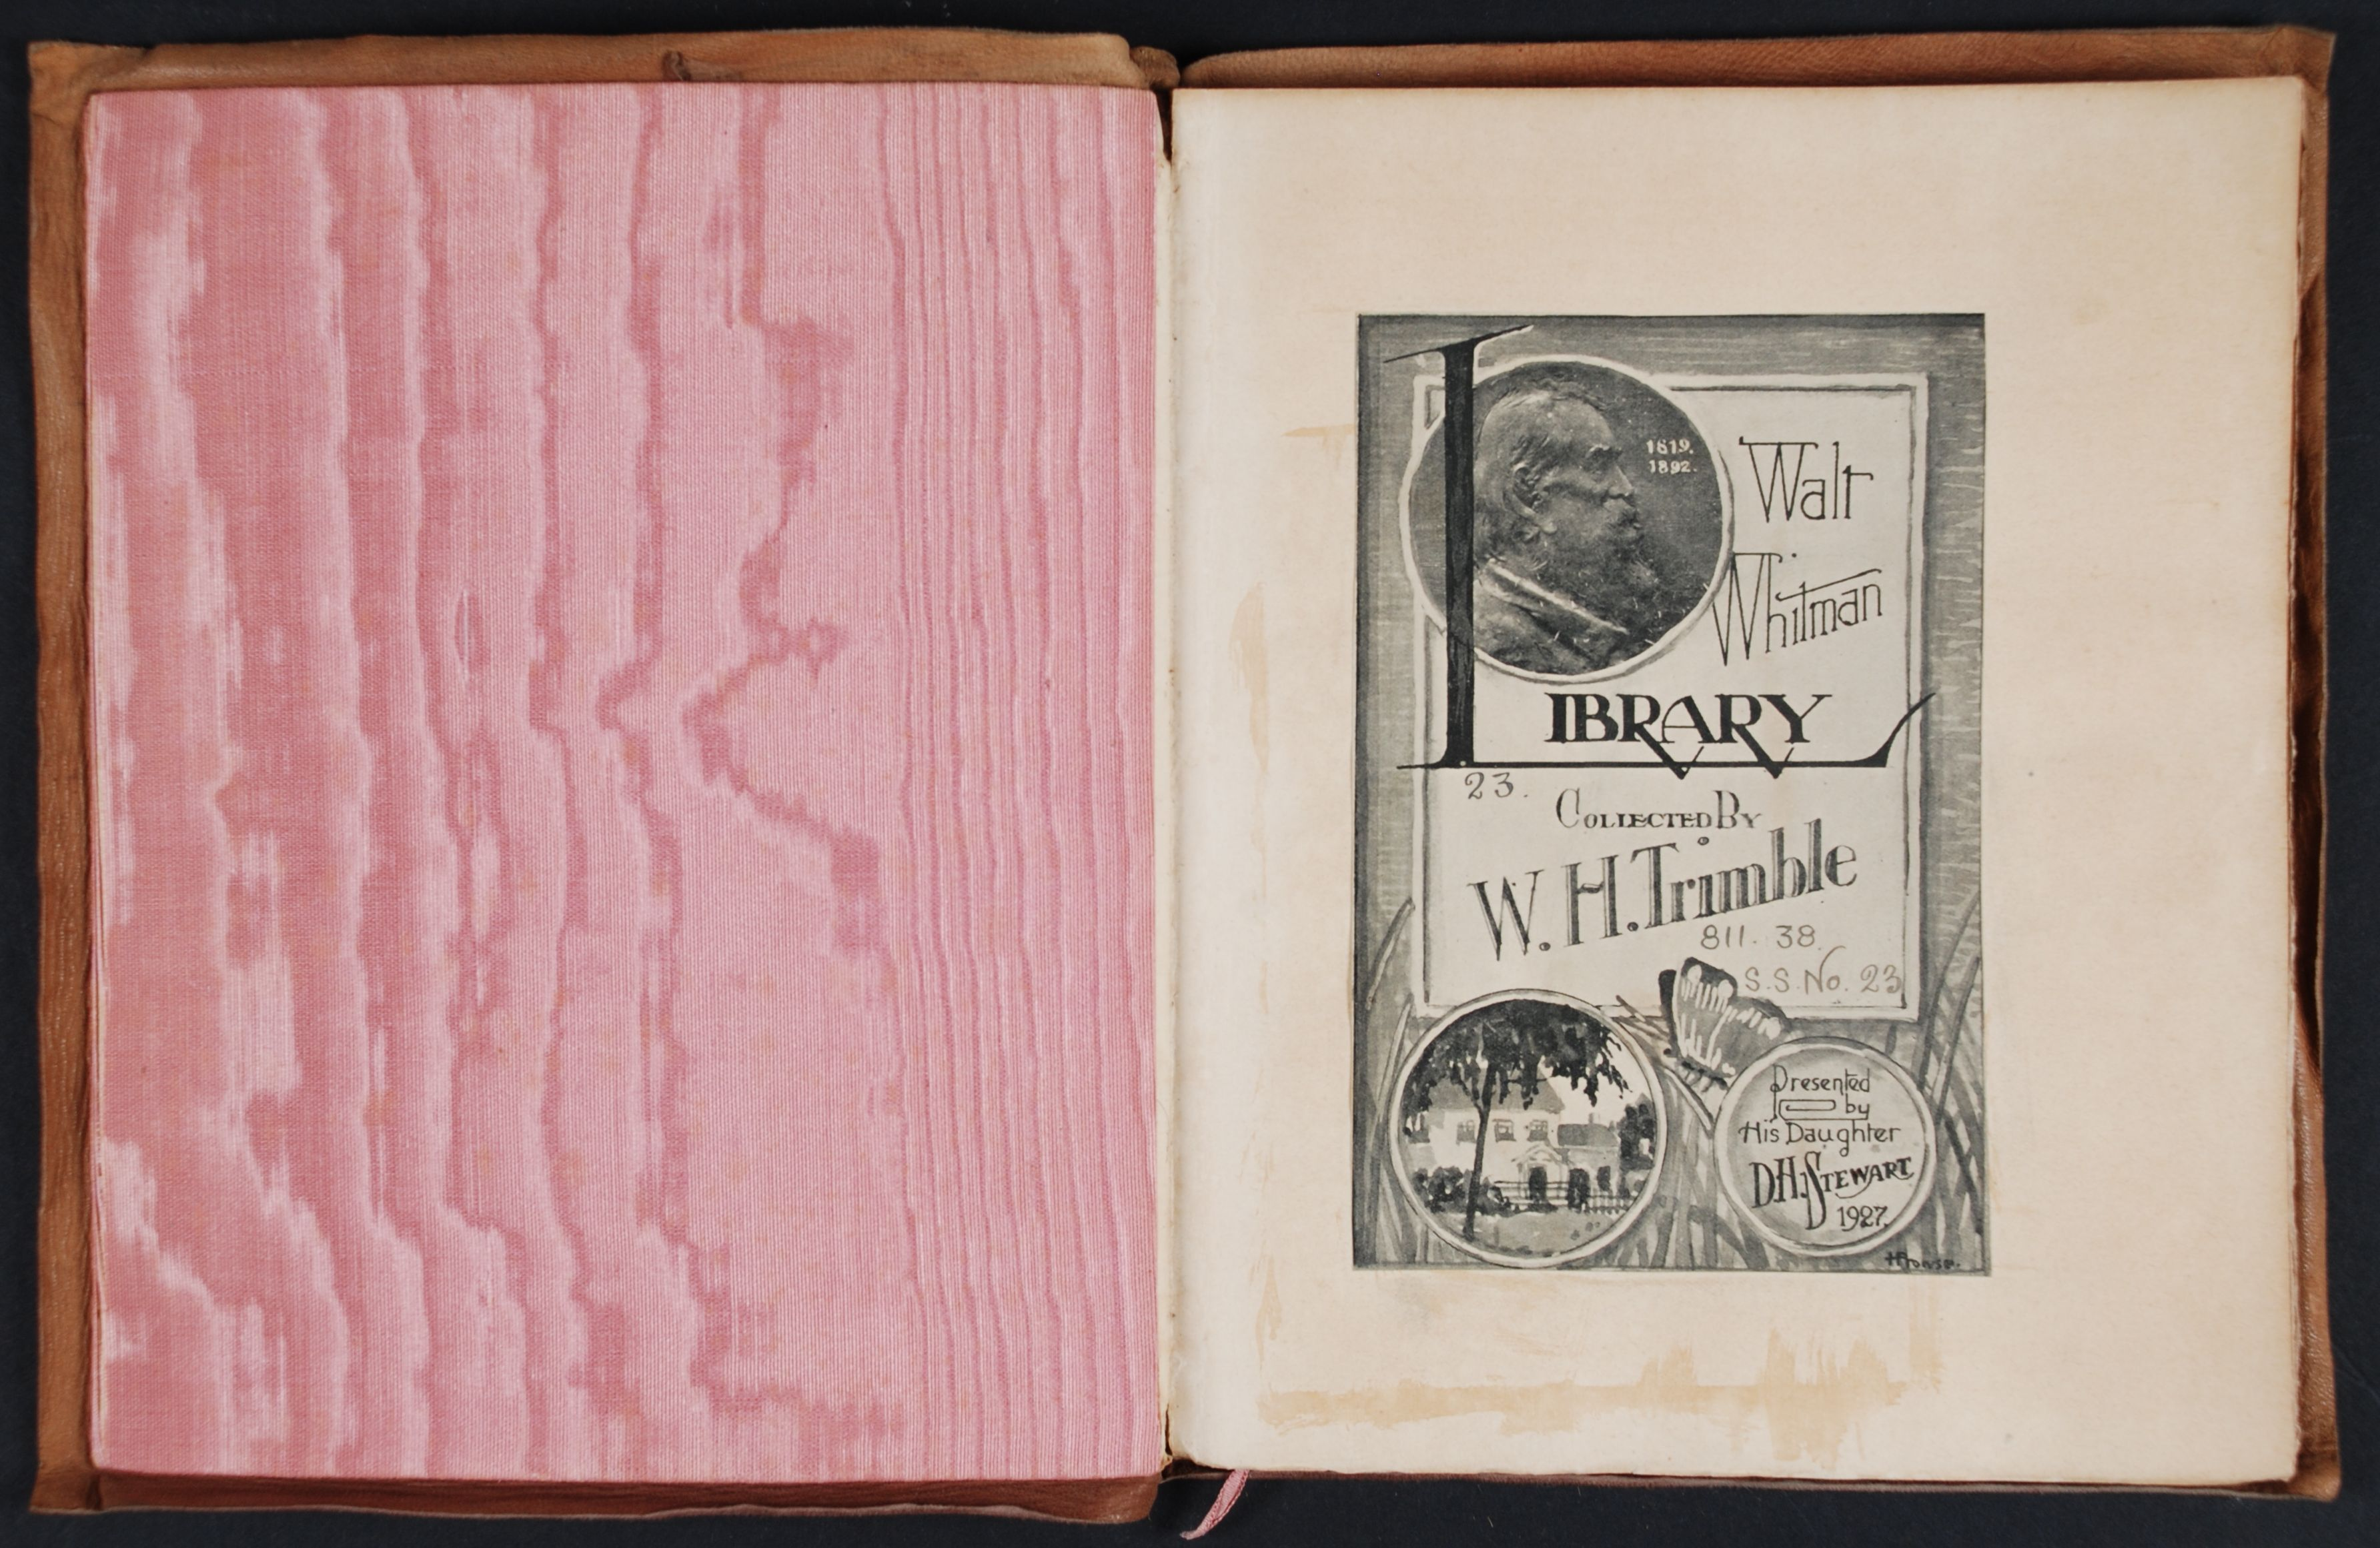 Walt Whitman. Song of Myself. New York: Roycrofters, 1904.